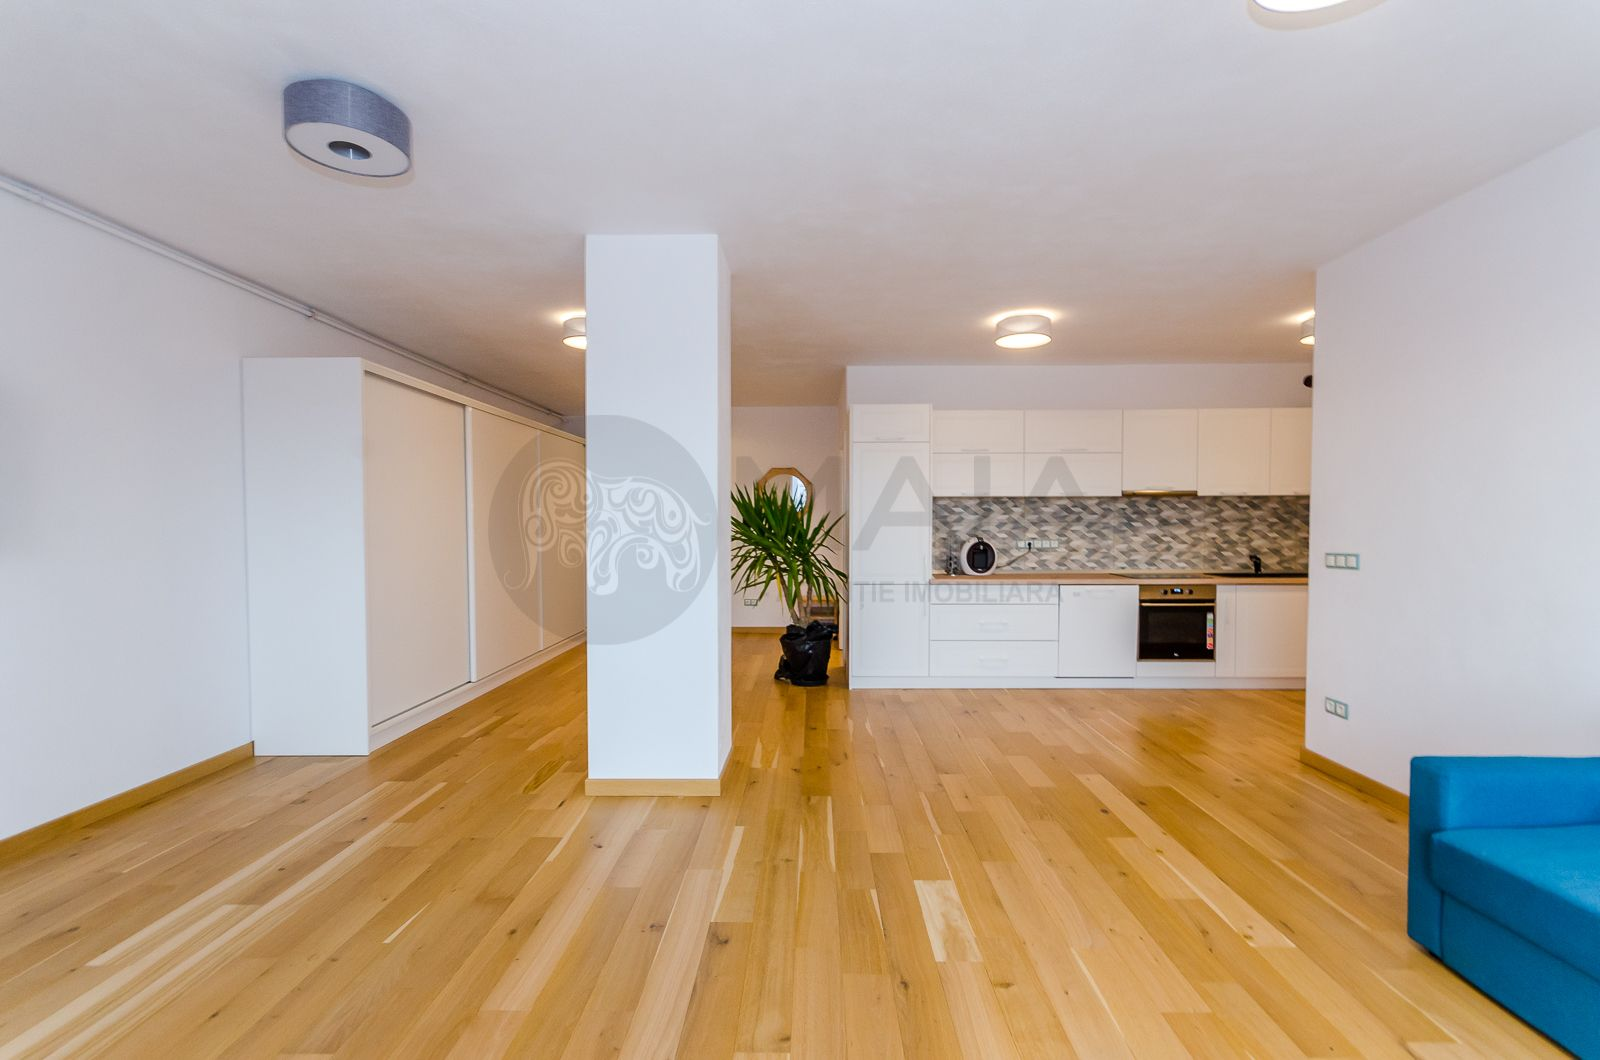 Apartament 3 camere de lux, cu parcare subterana, zona Trei Stejari